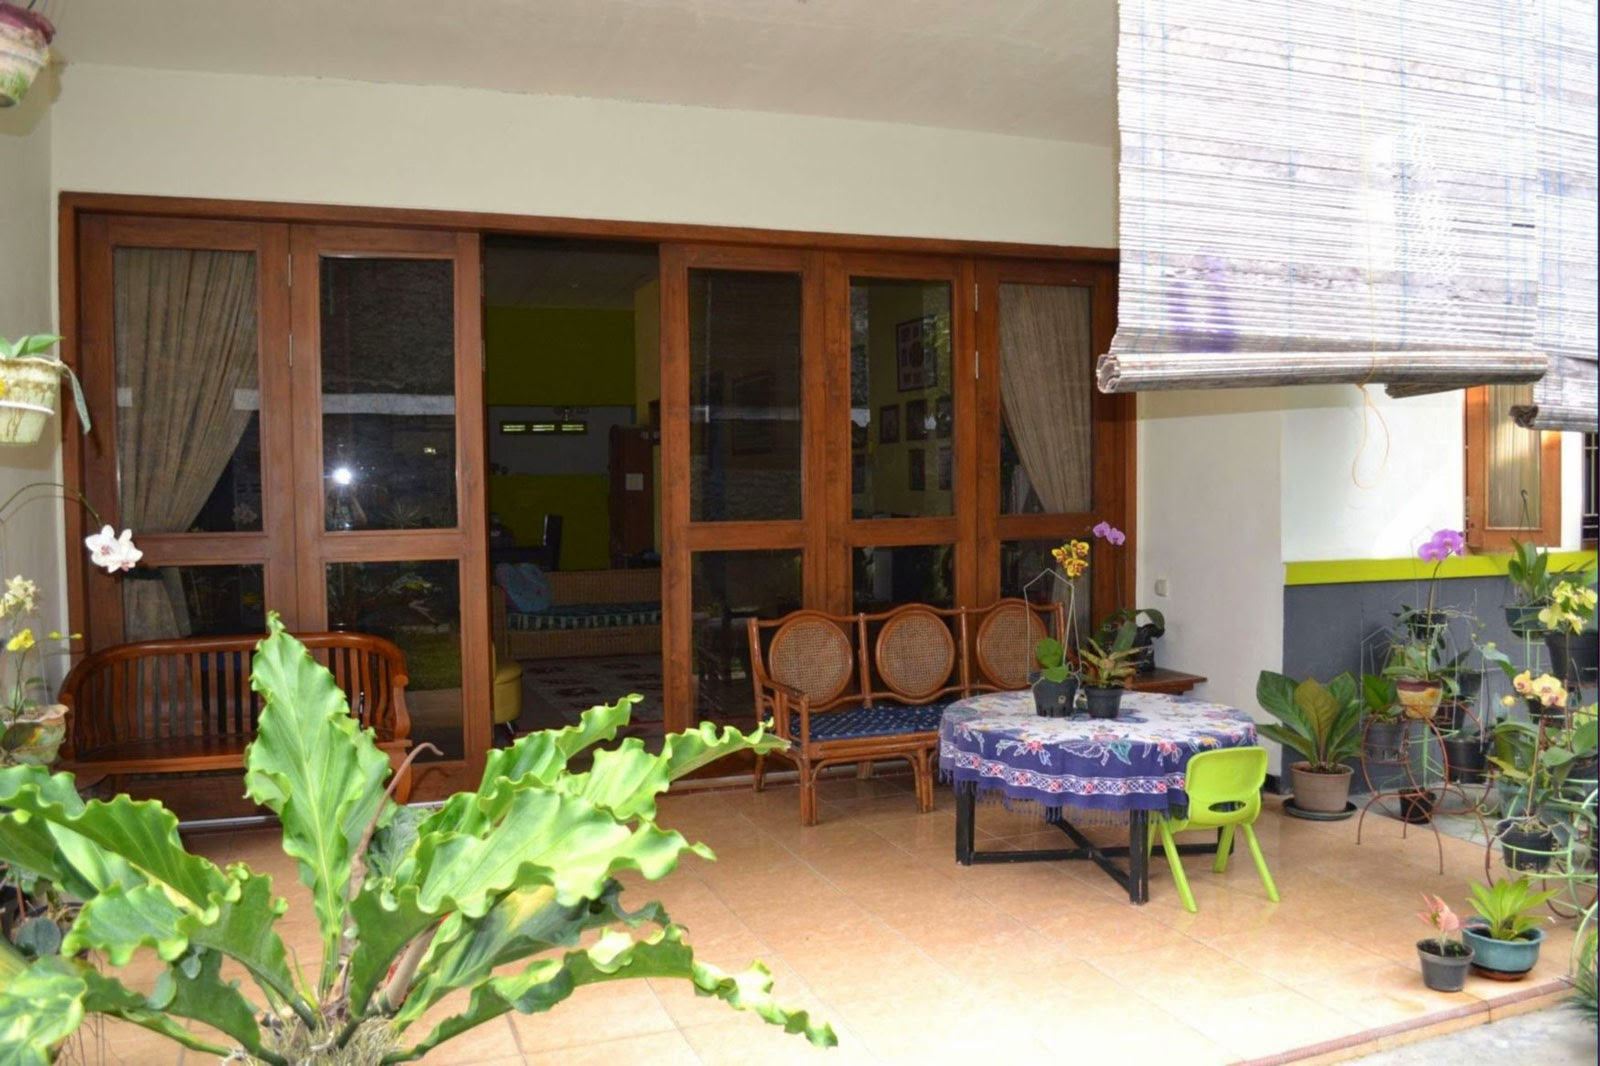 Seat-Terrace-House-Of-Materials-Teak